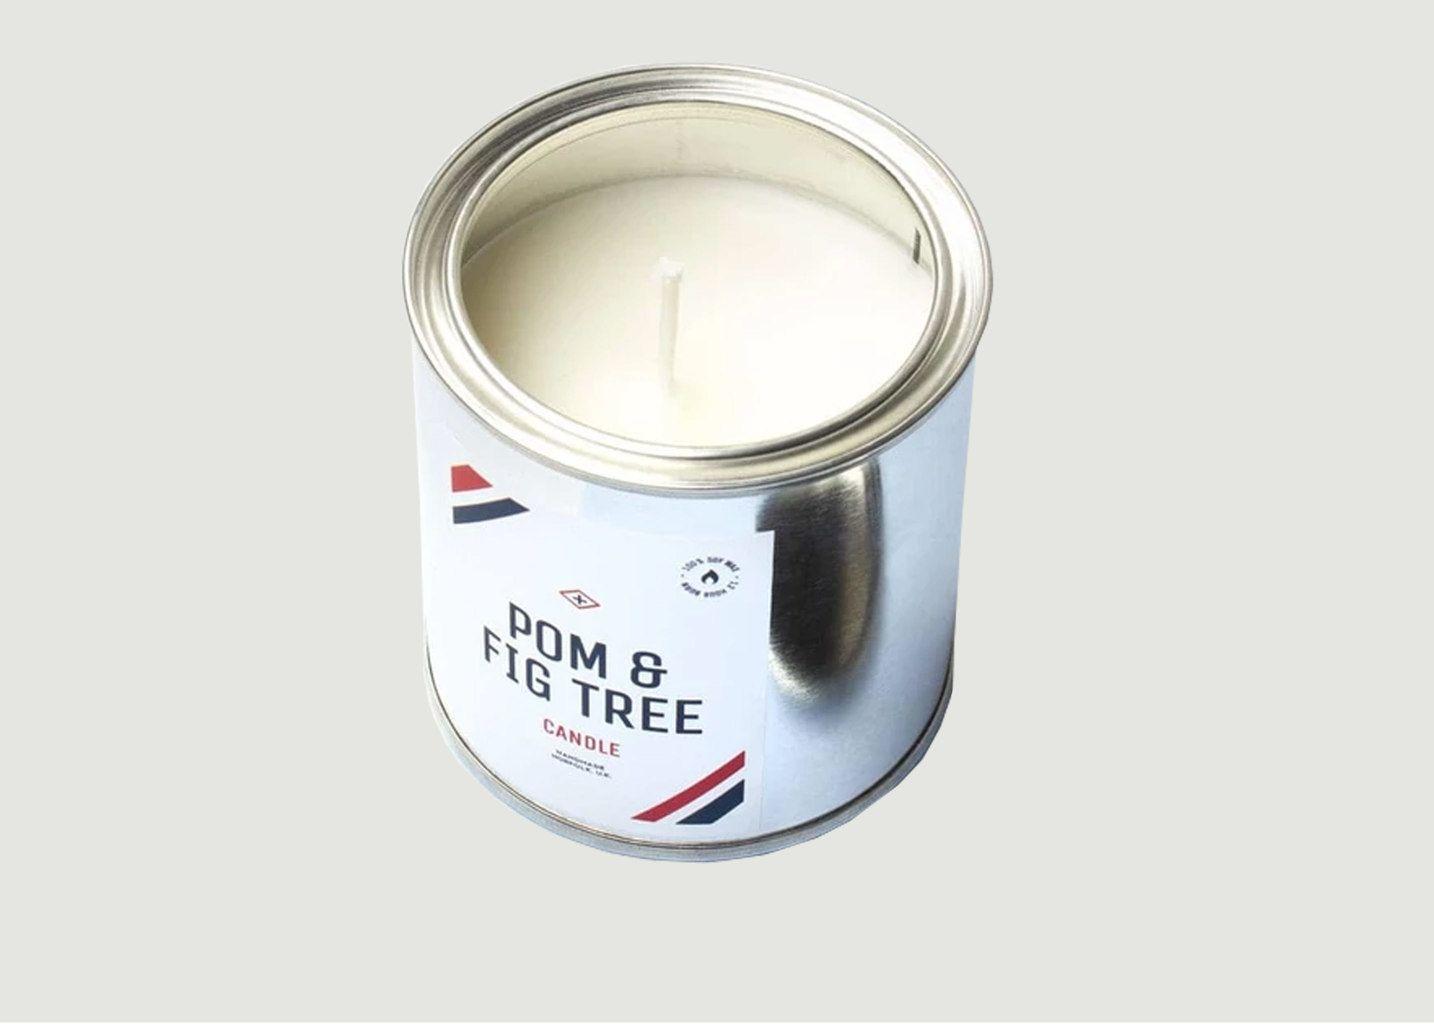 Bougie Pot de Peinture Grenade et Figue - Men's Society